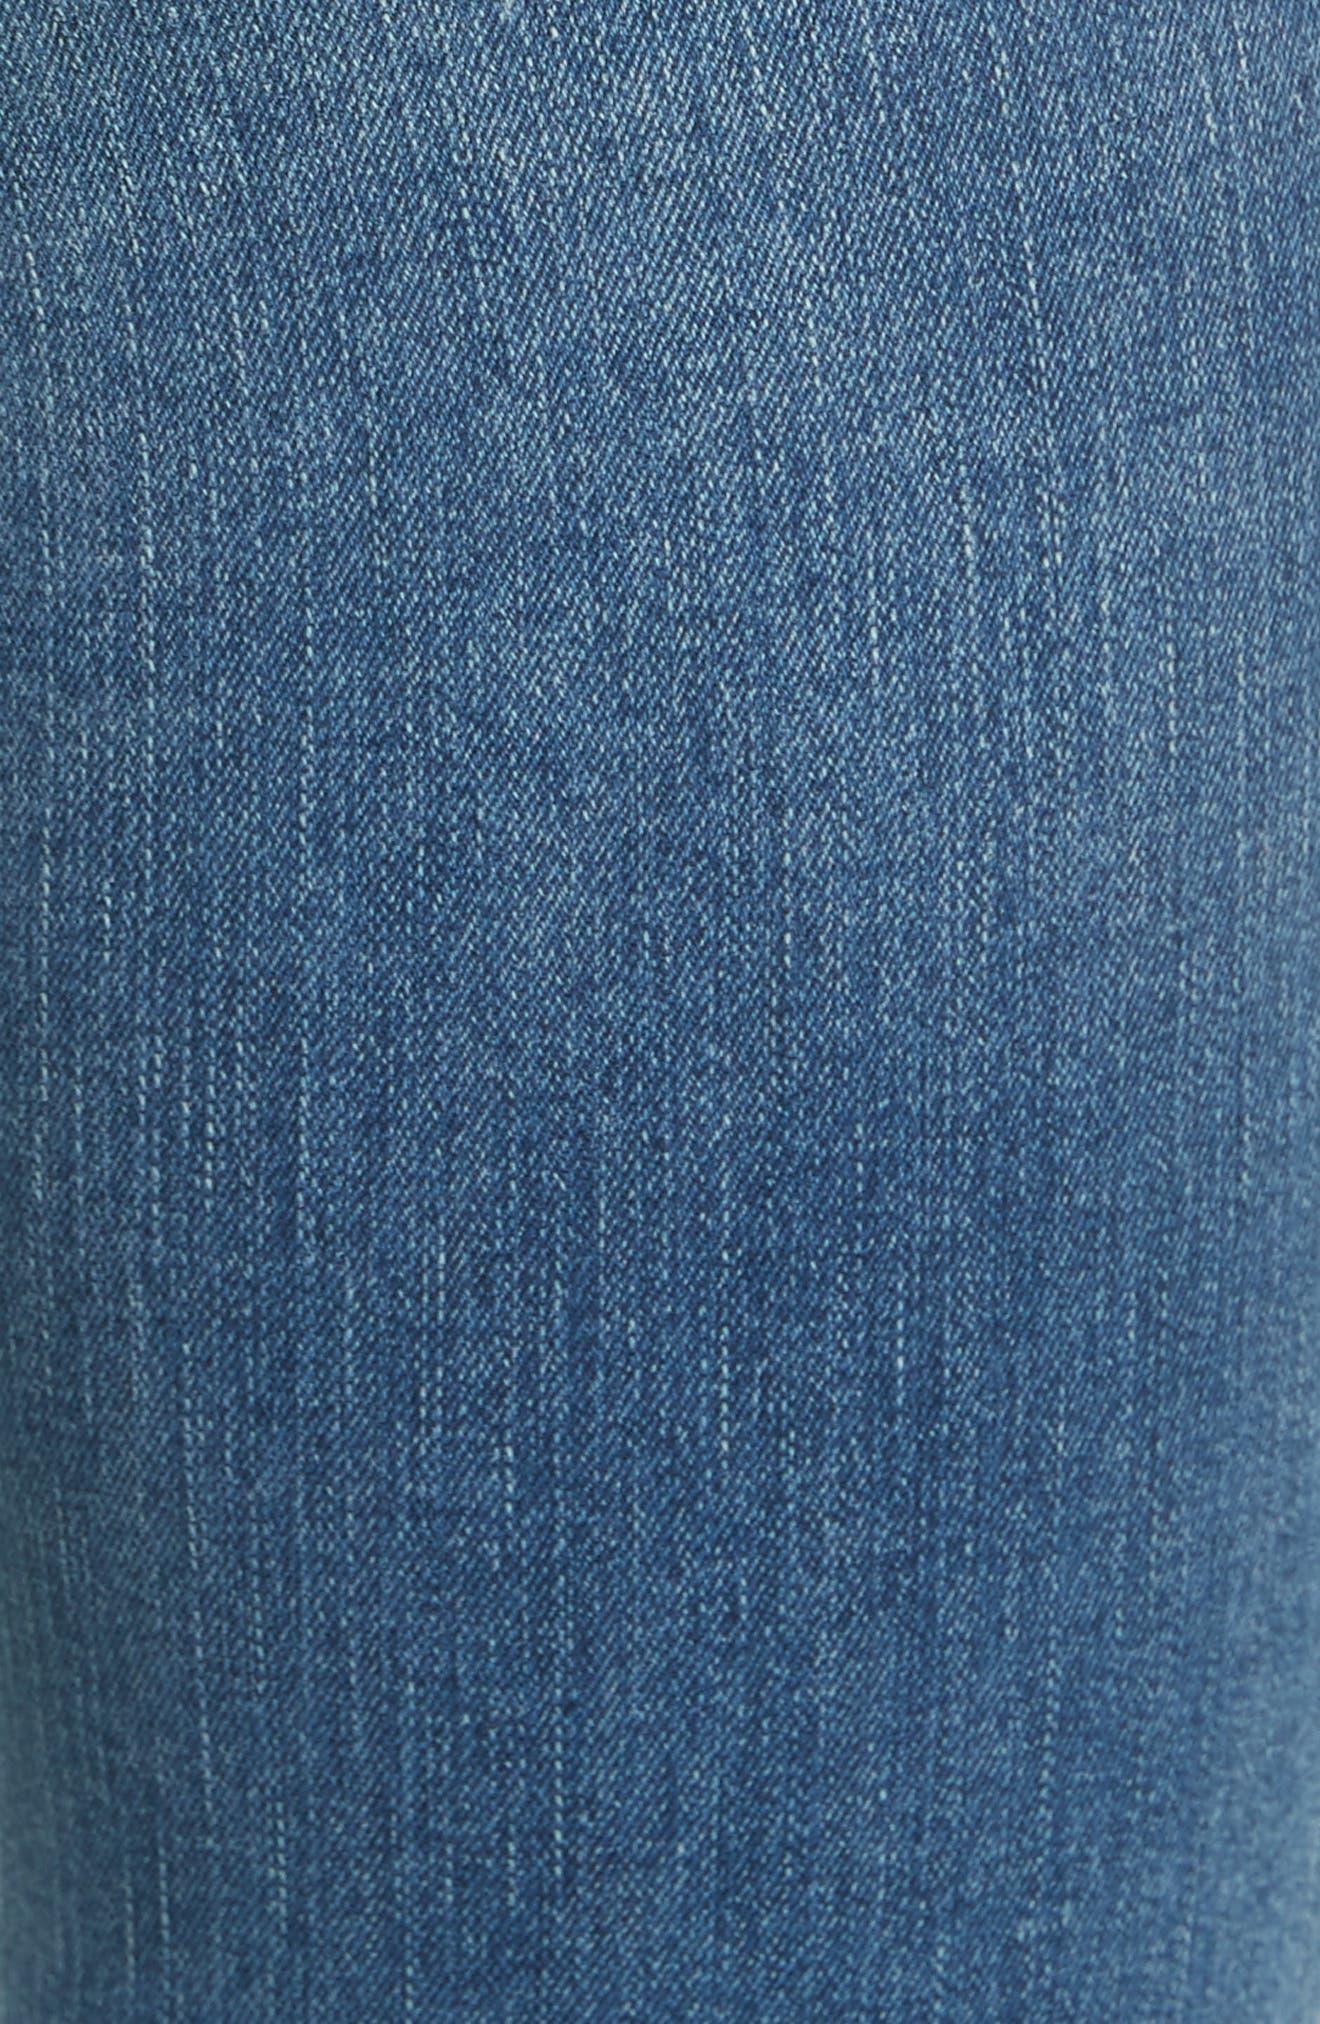 High Waist Crop Straight Leg Jeans,                             Alternate thumbnail 6, color,                             Blue